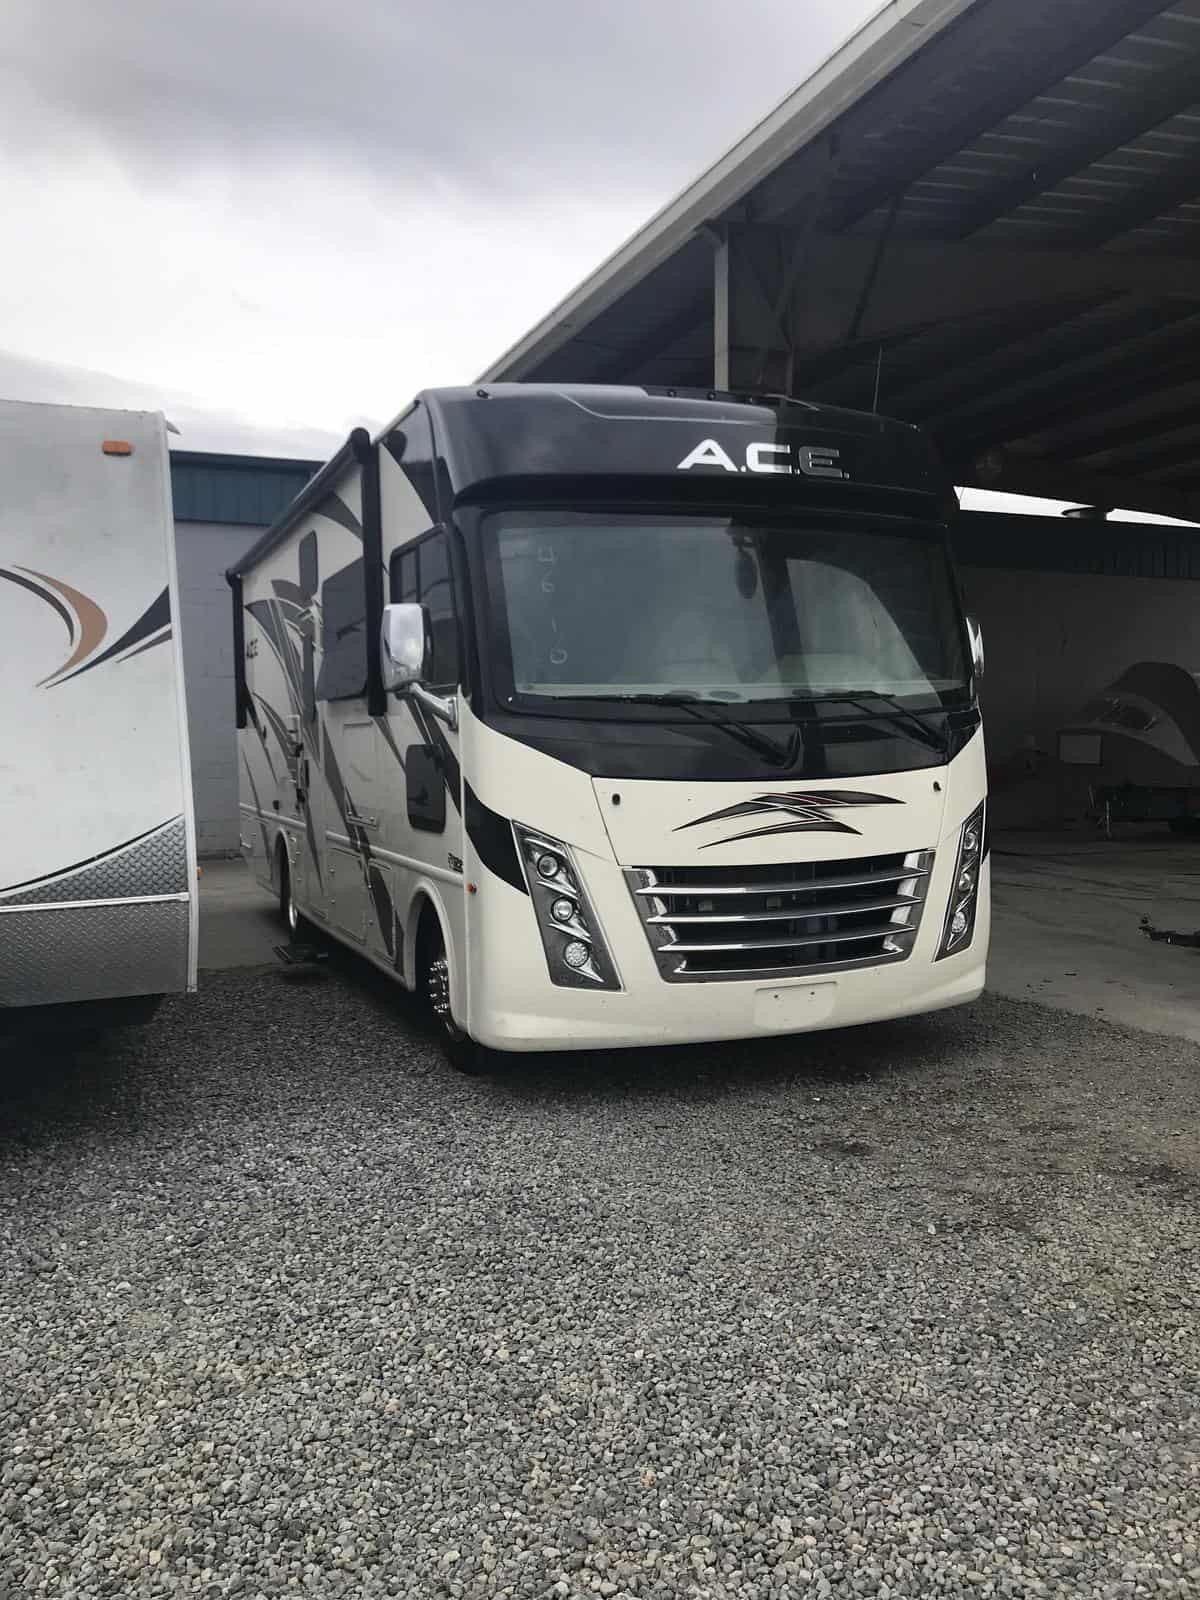 Photo 2021 Thor Motor Coach ACE 27.2 $ 114704